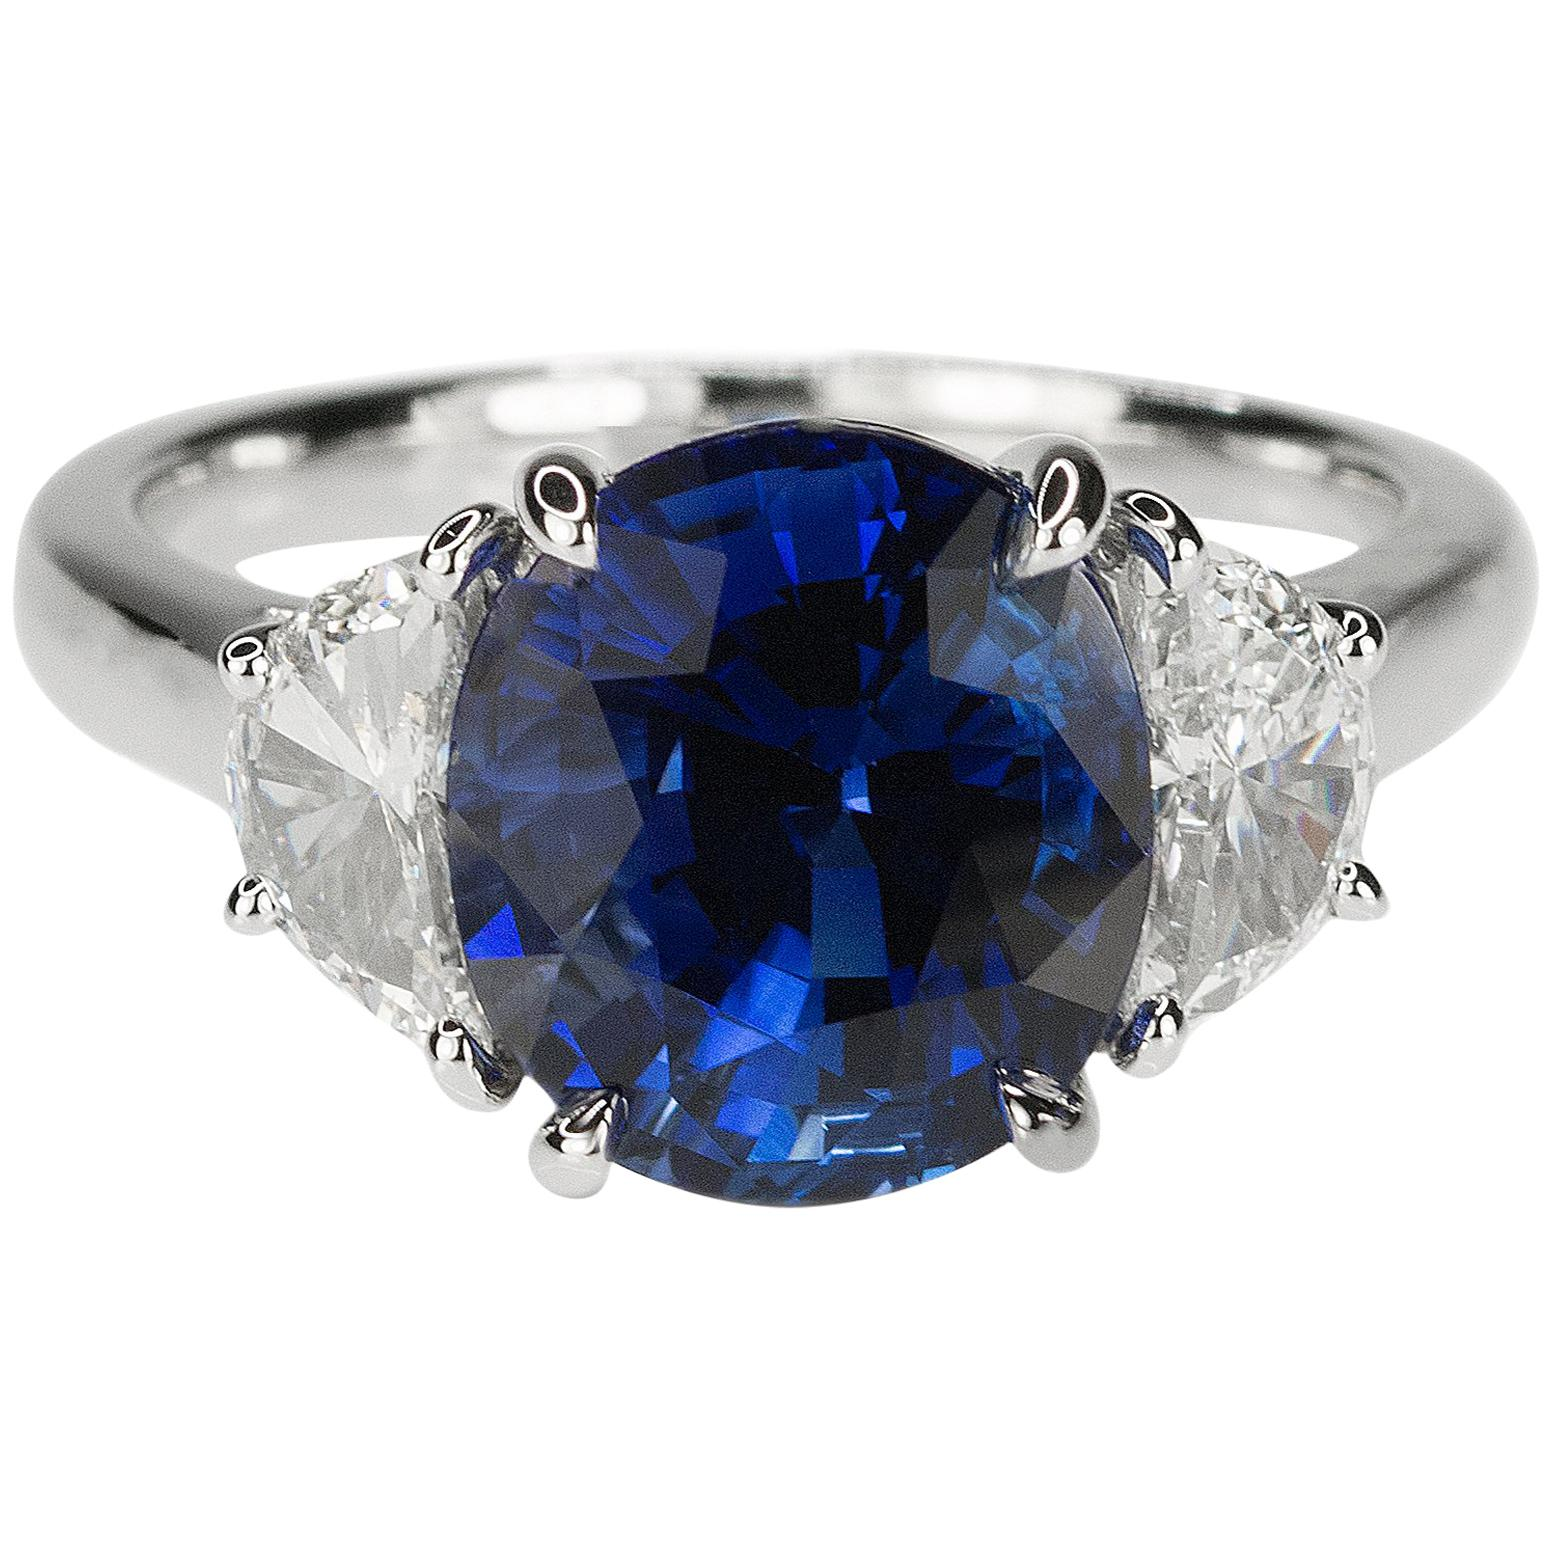 Platinum AGL Certified 5.18 Carat Ceylon Sapphire Ring